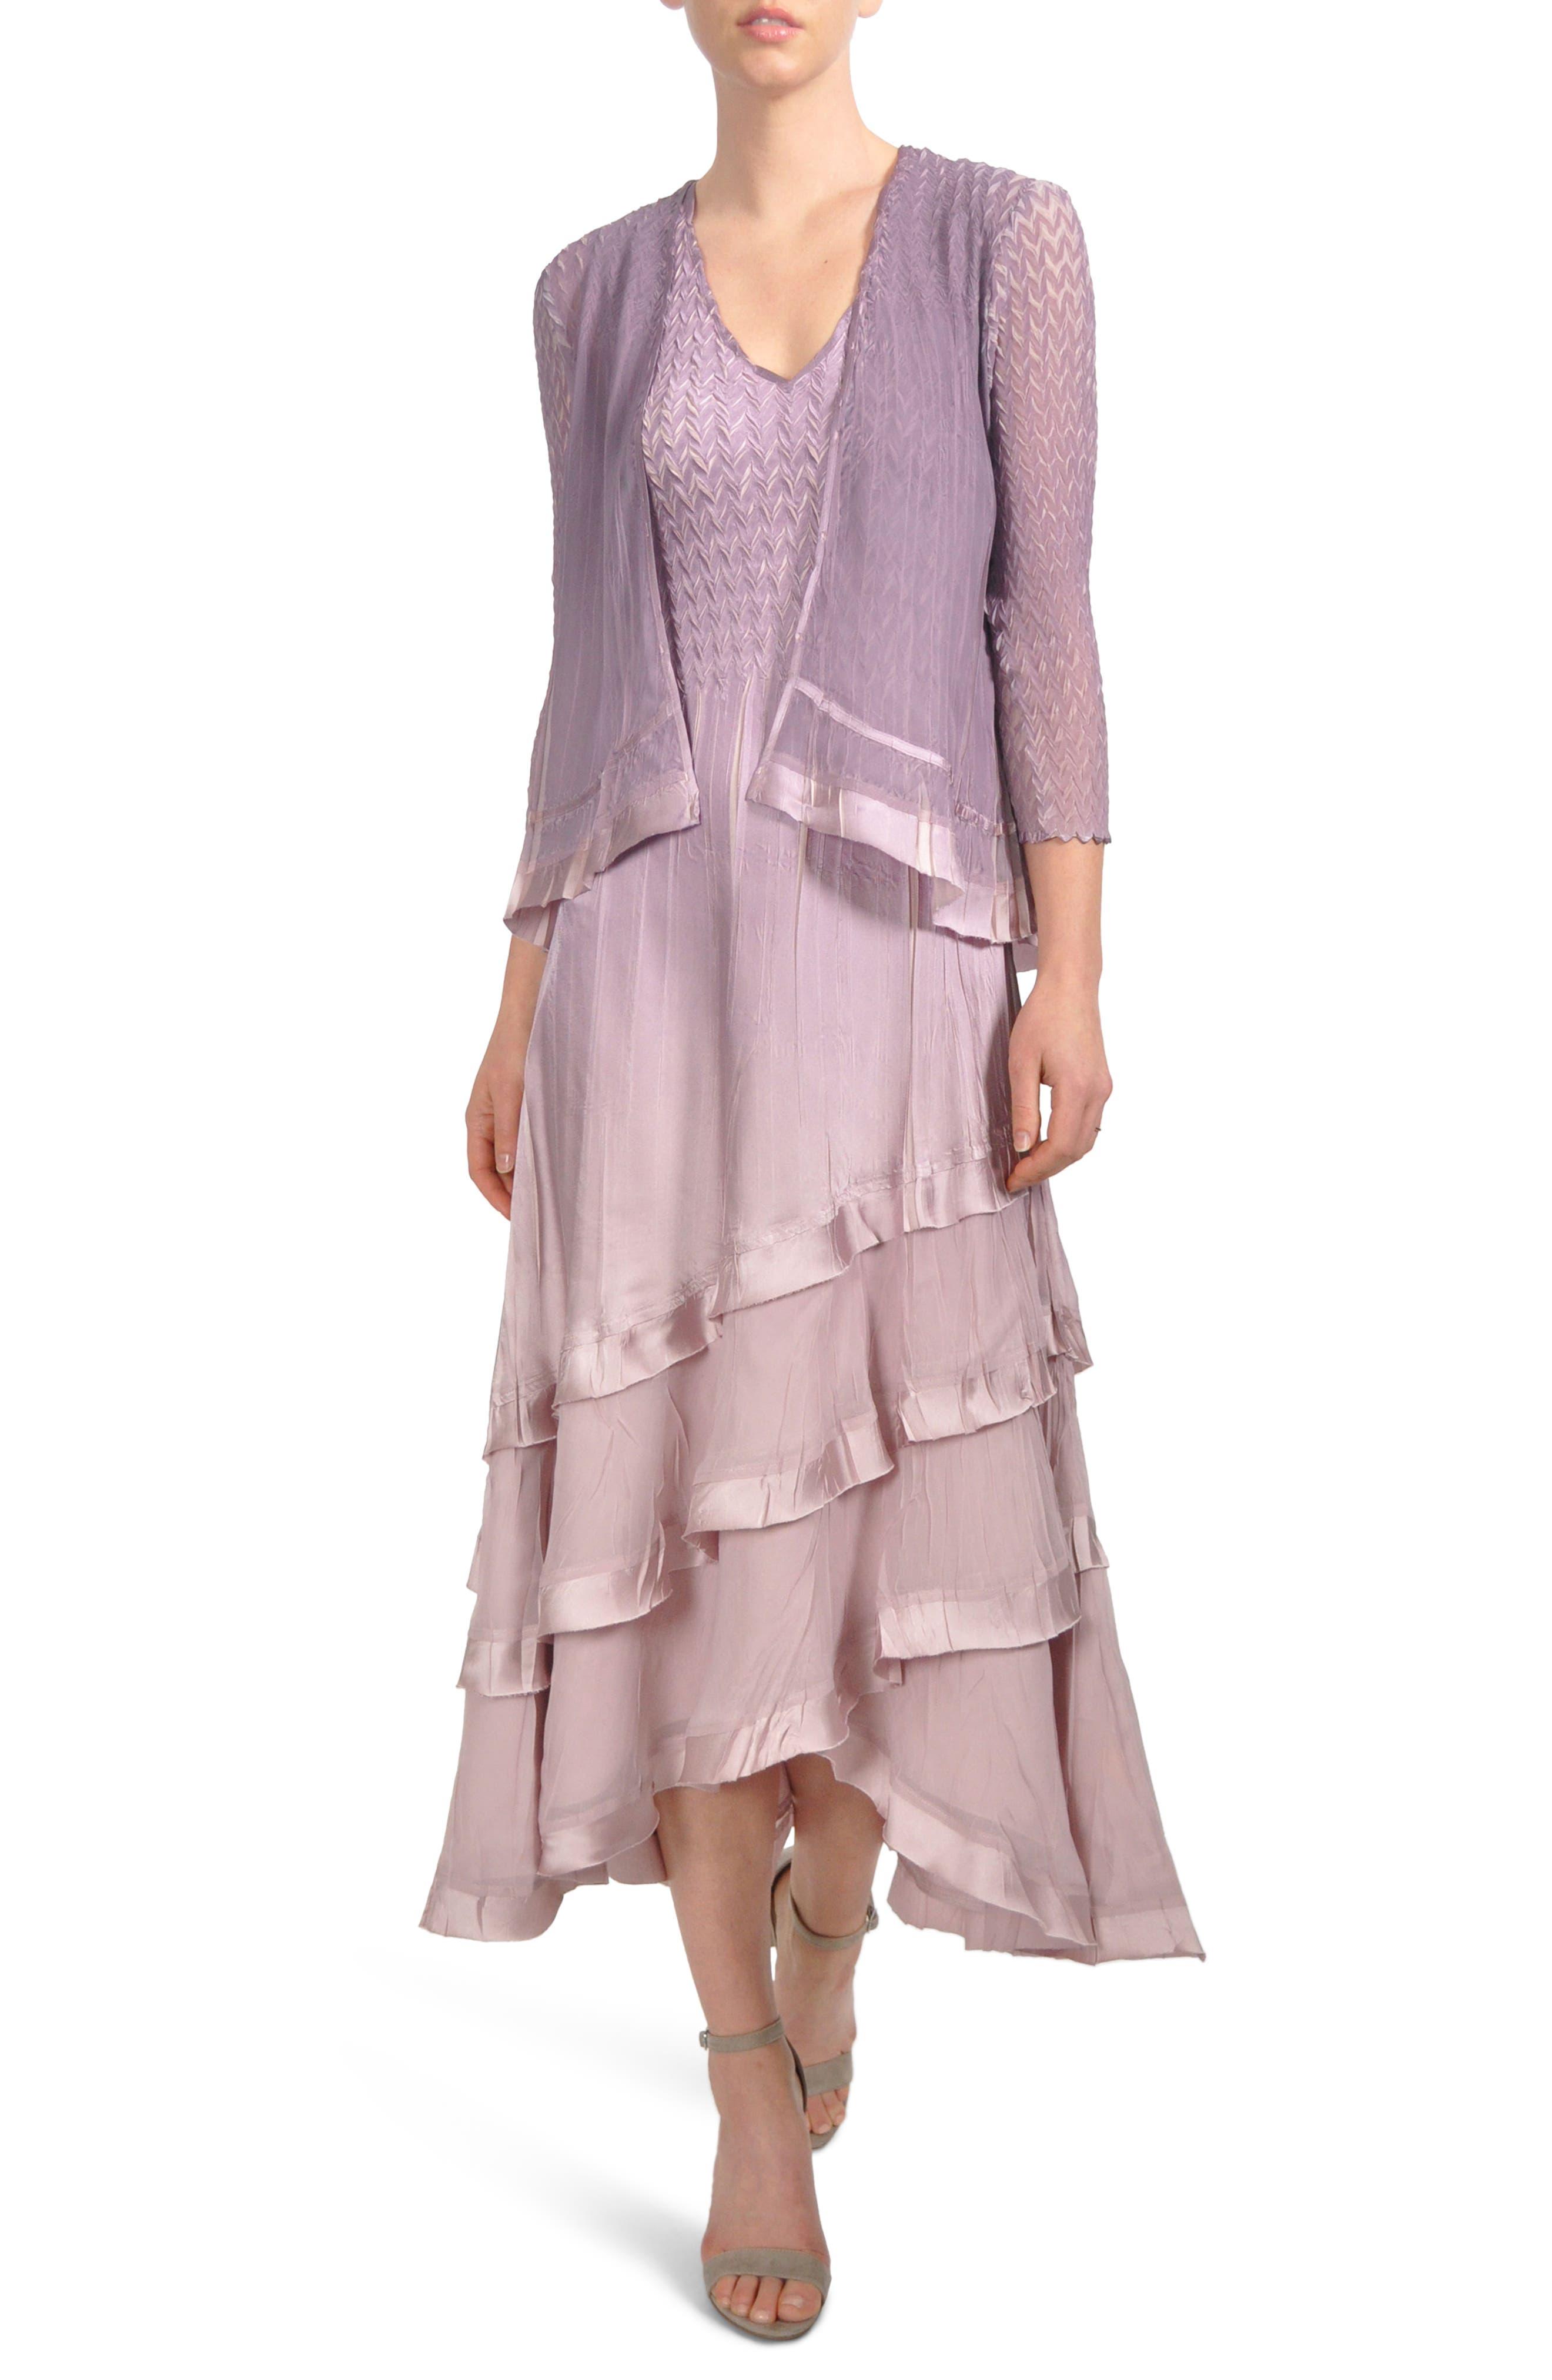 Main Image - Komarov Tiered Hem Dress with Jacket (Regular & Petite)